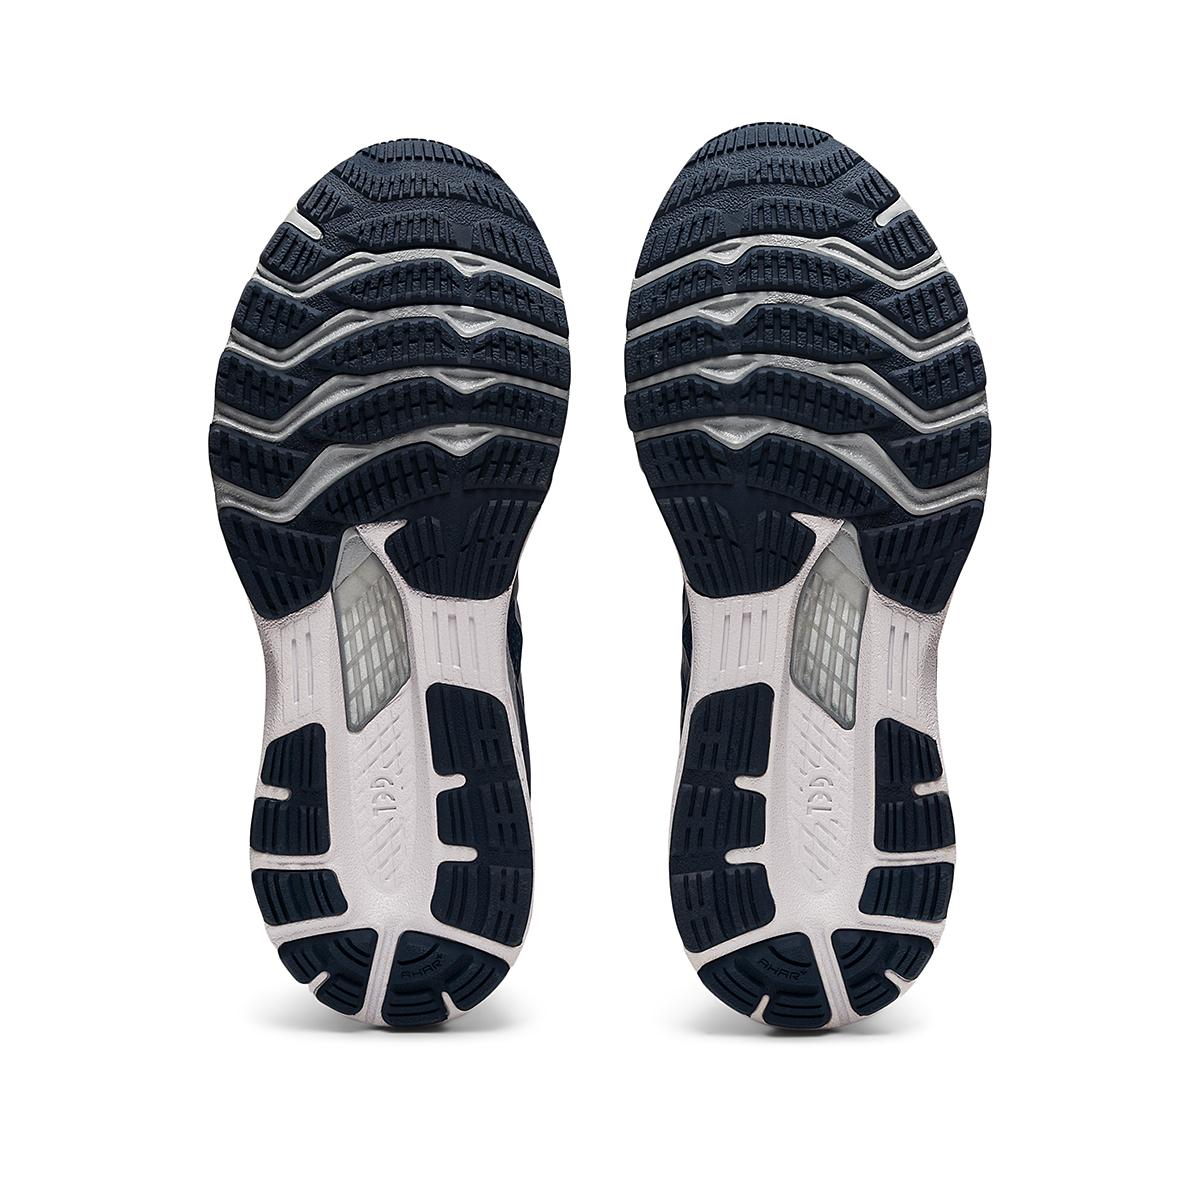 Women's Asics Gel-Kayano 28 Running Shoe - Color: French Blue/Thunder Blue - Size: 5 - Width: Wide, French Blue/Thunder Blue, large, image 7